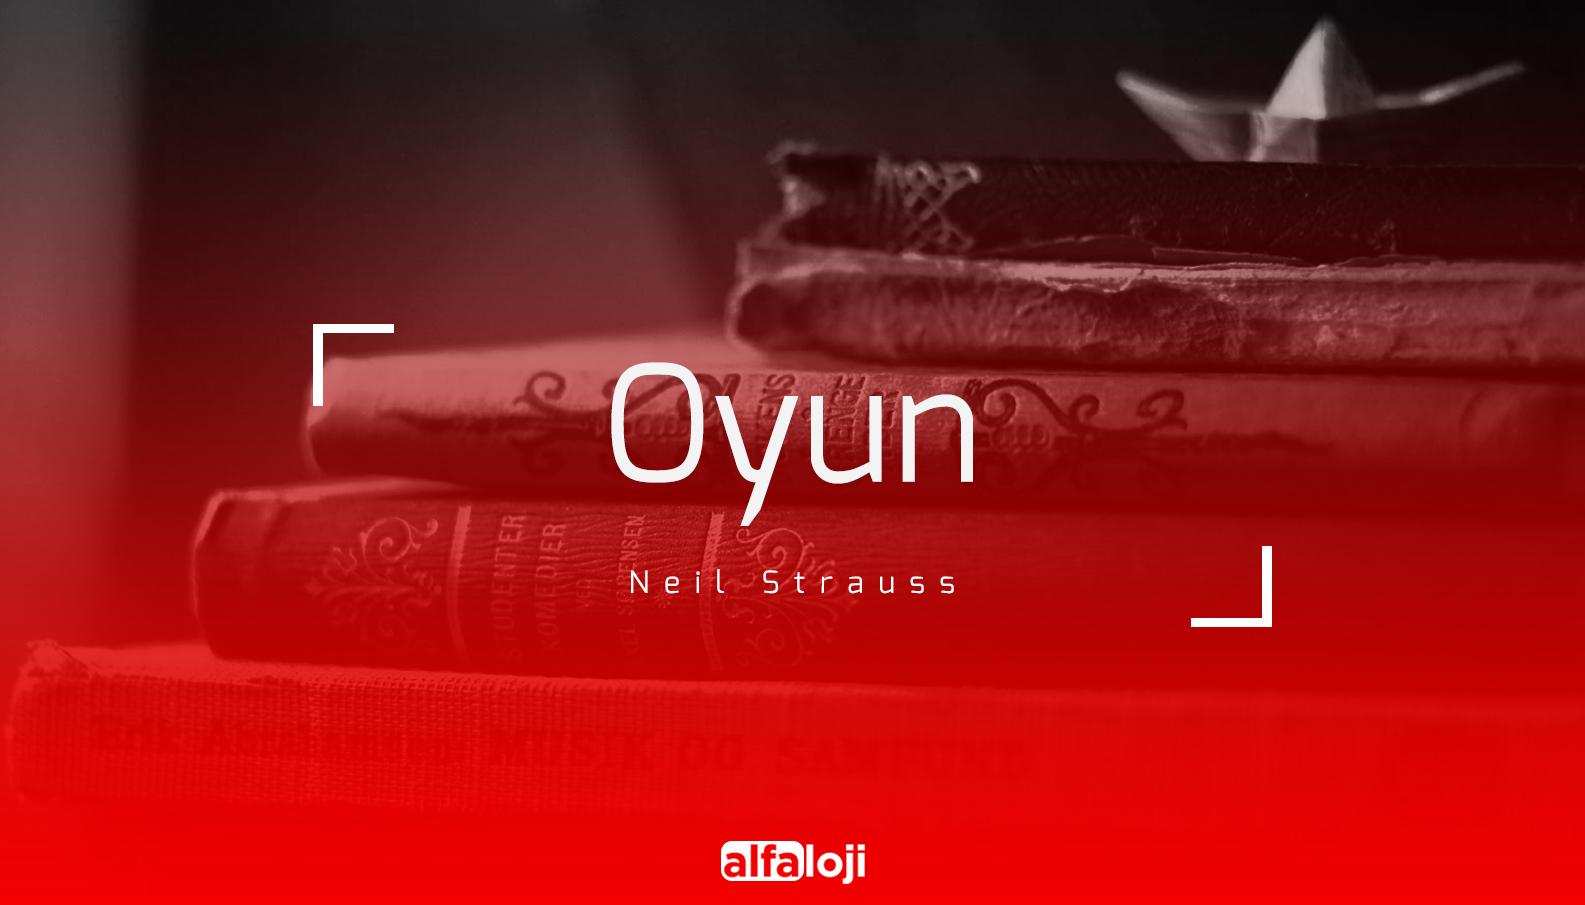 Neil Strauss - Oyun